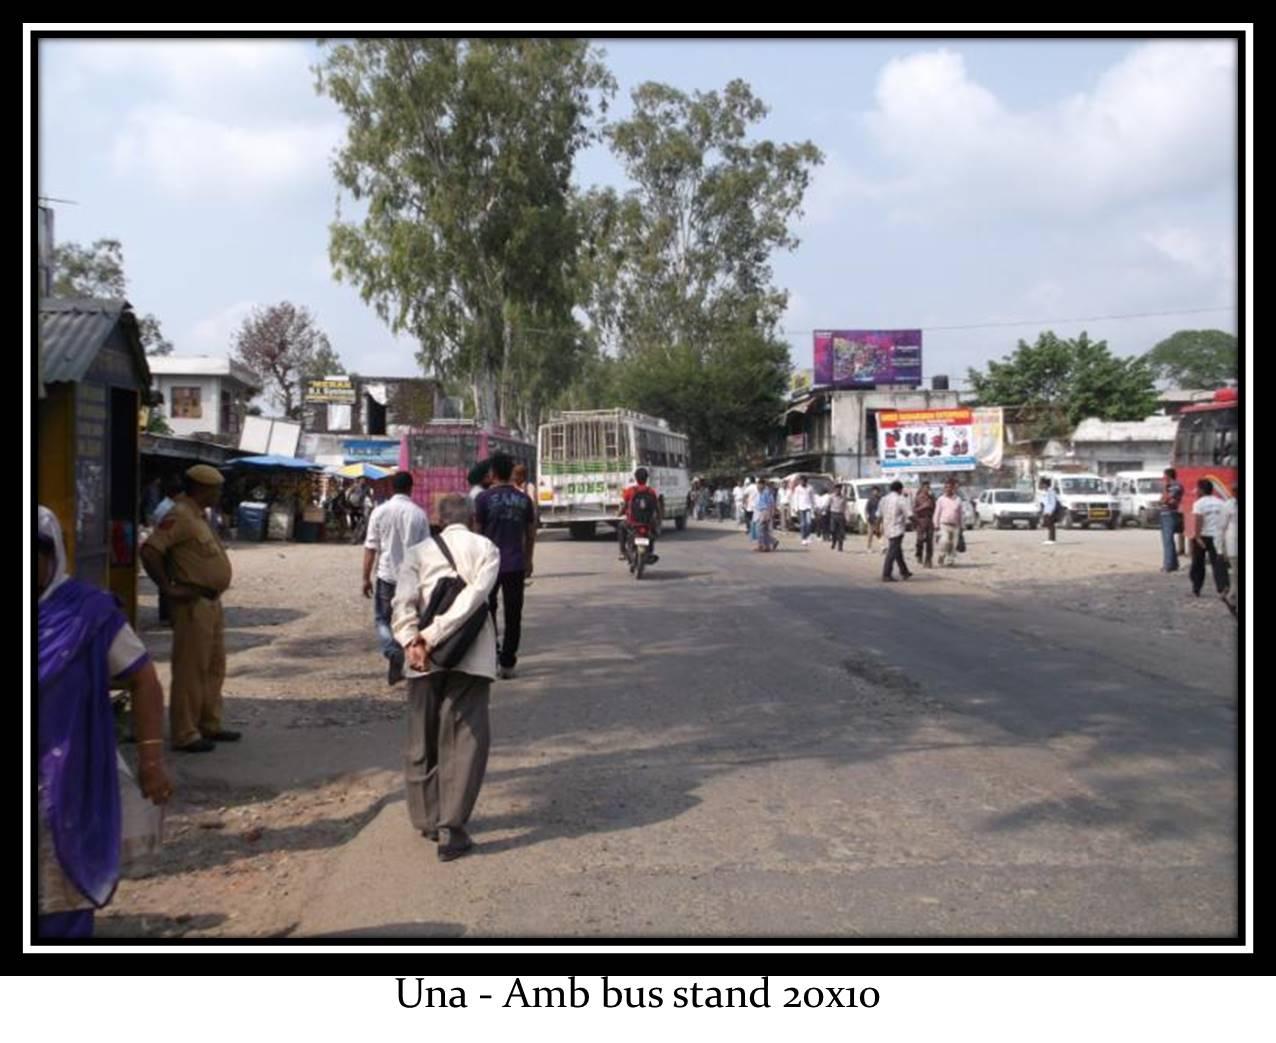 Amb bus stand, Una